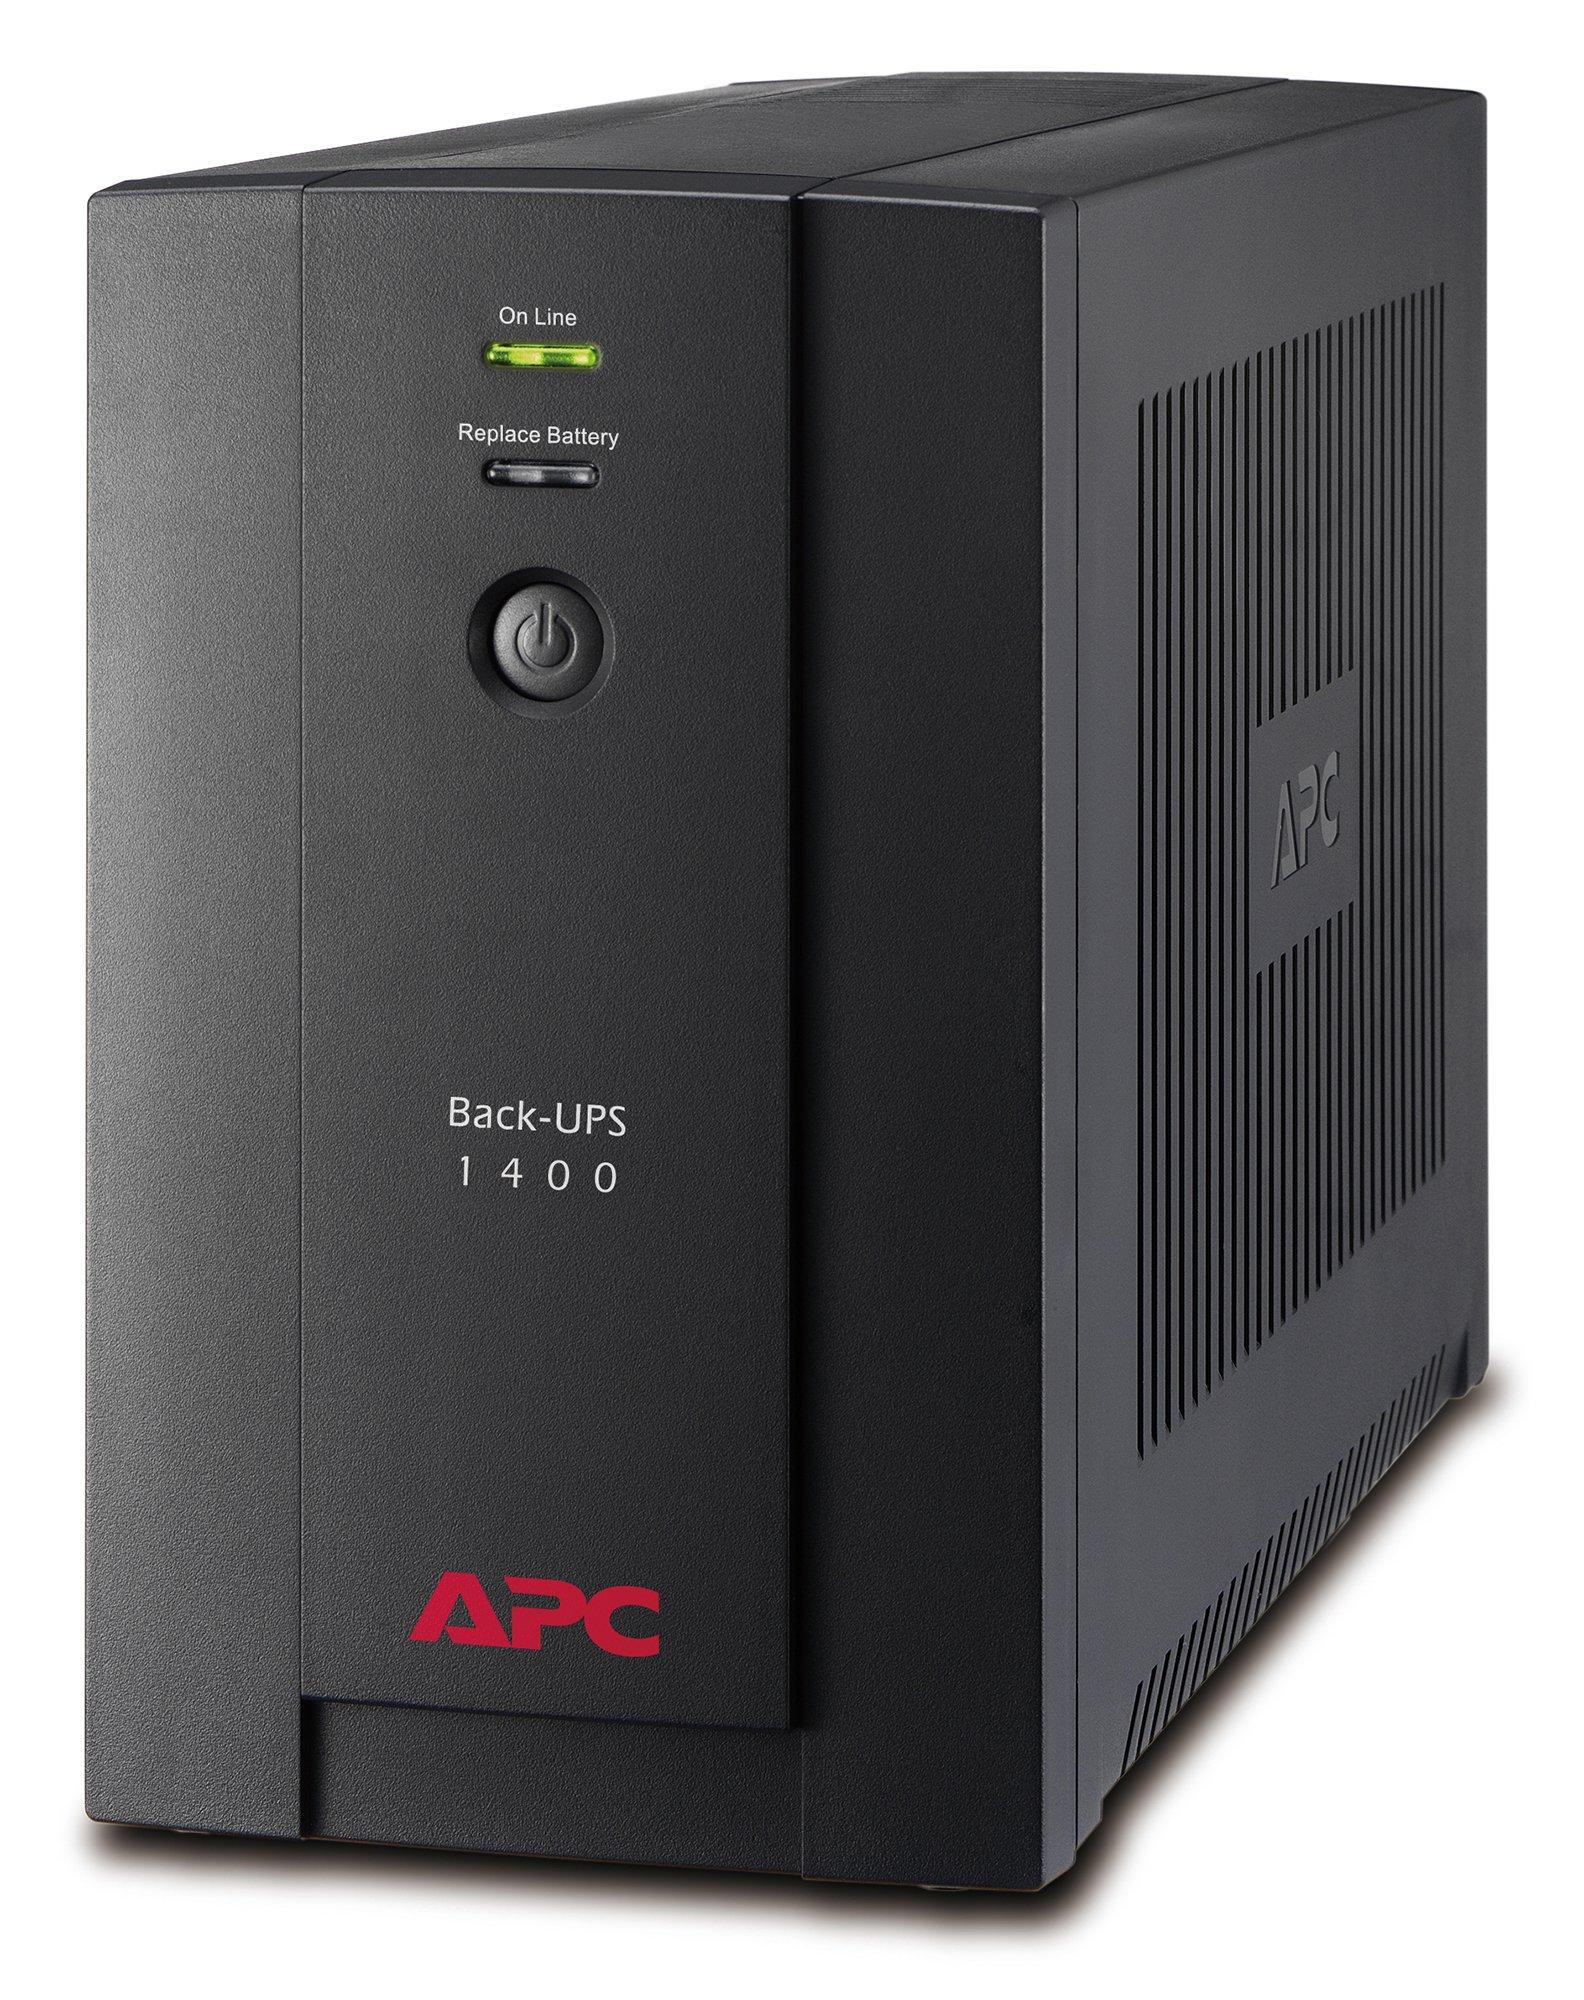 An image of APC Back-UPS 1.4kVA Line Interactive 230V (UPS) (Europe)